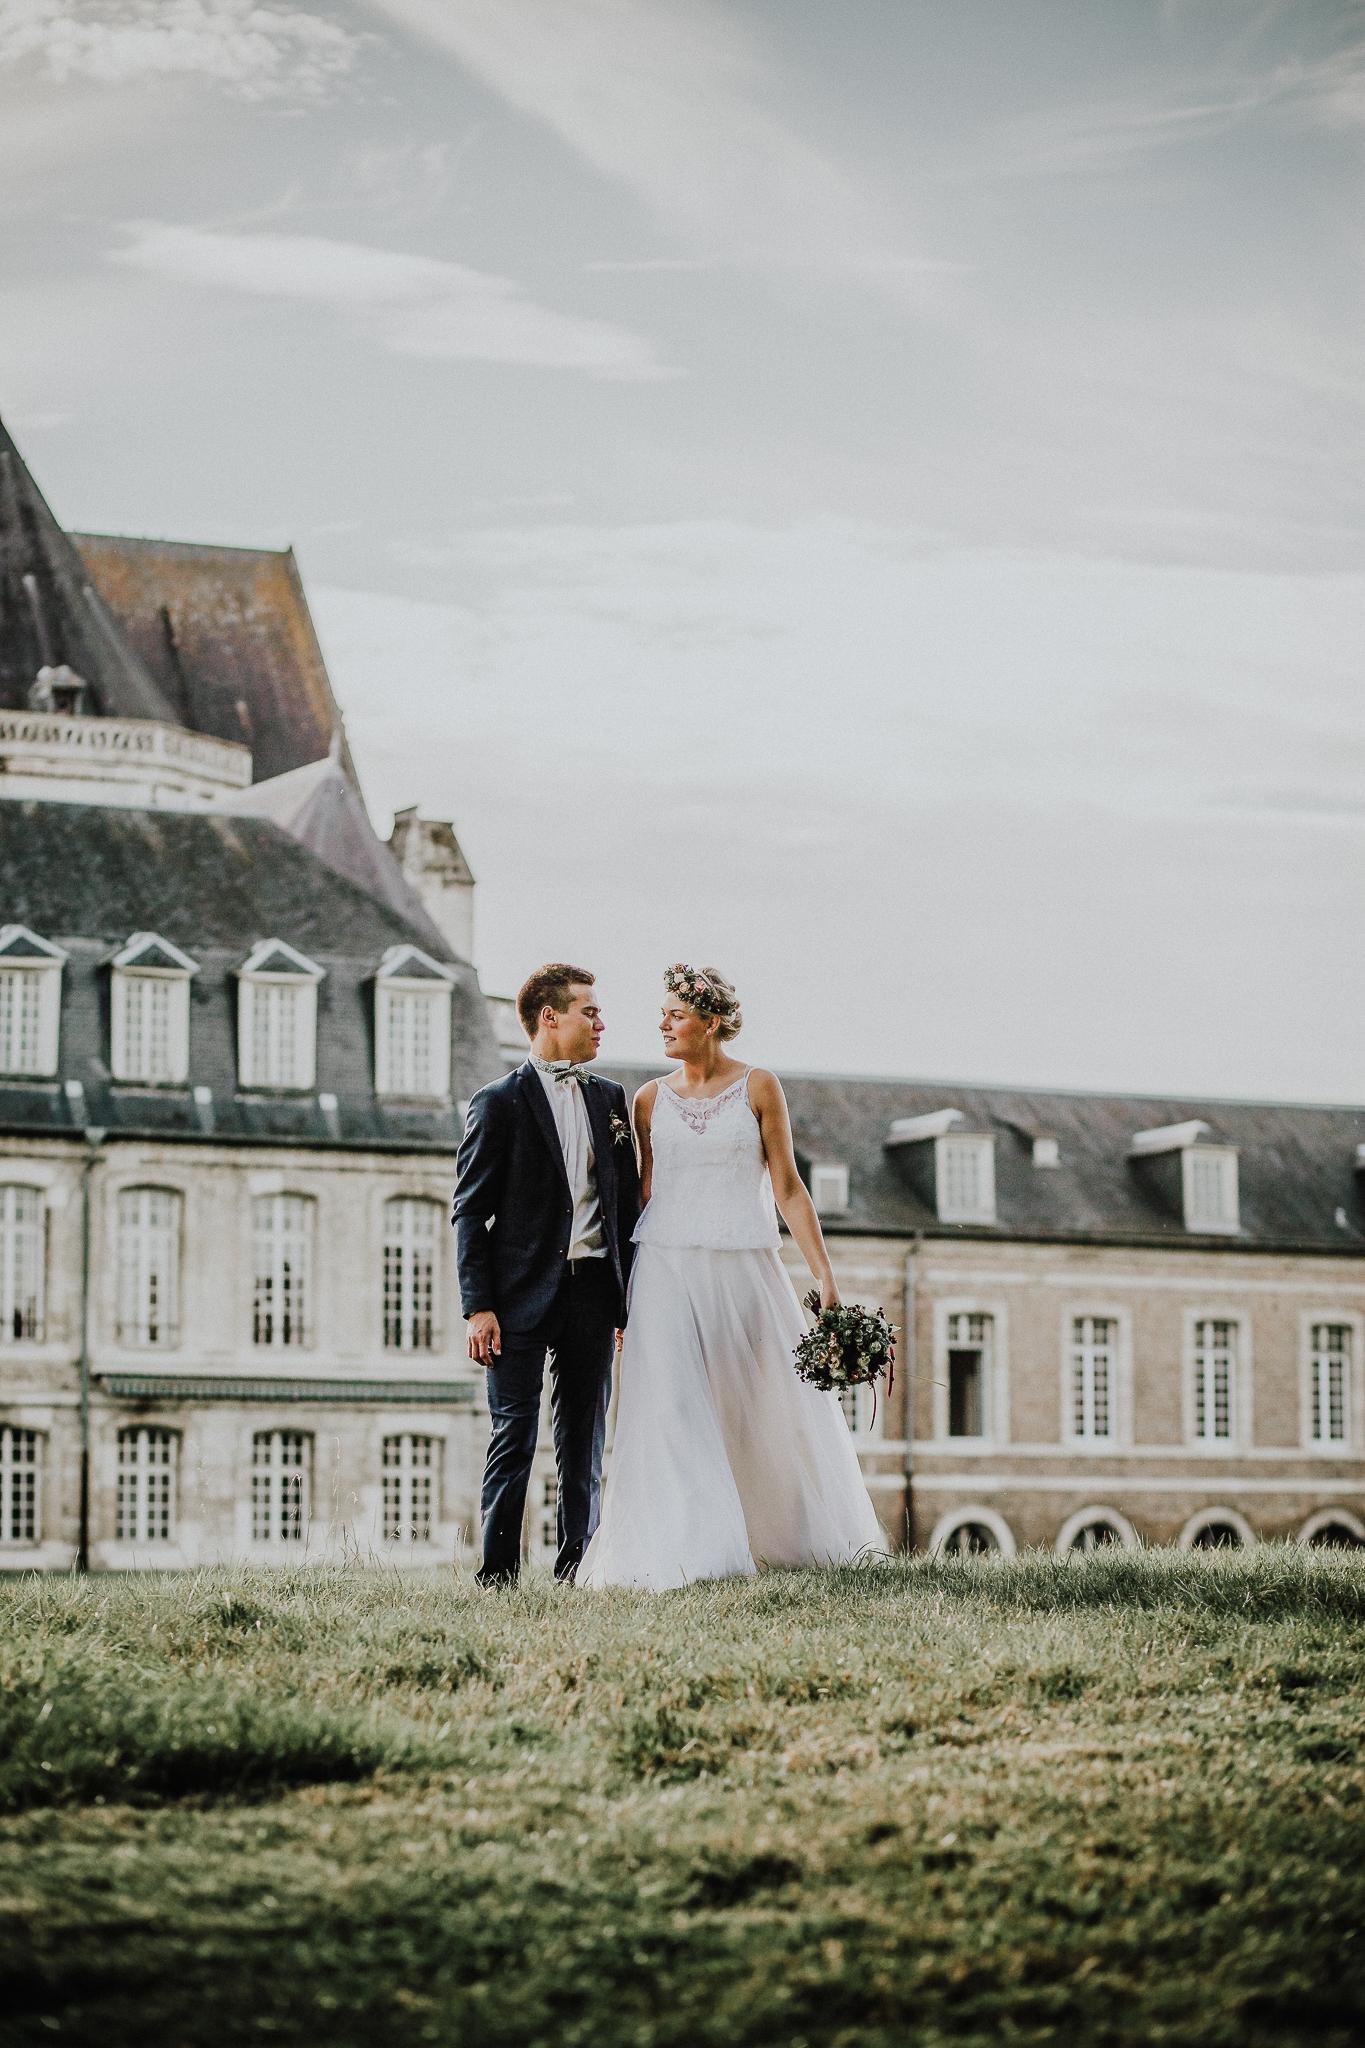 Dixie Martin Photography, Day After, Photographe de Mariage Baie de Somme, Abbaye de Saint Riquier